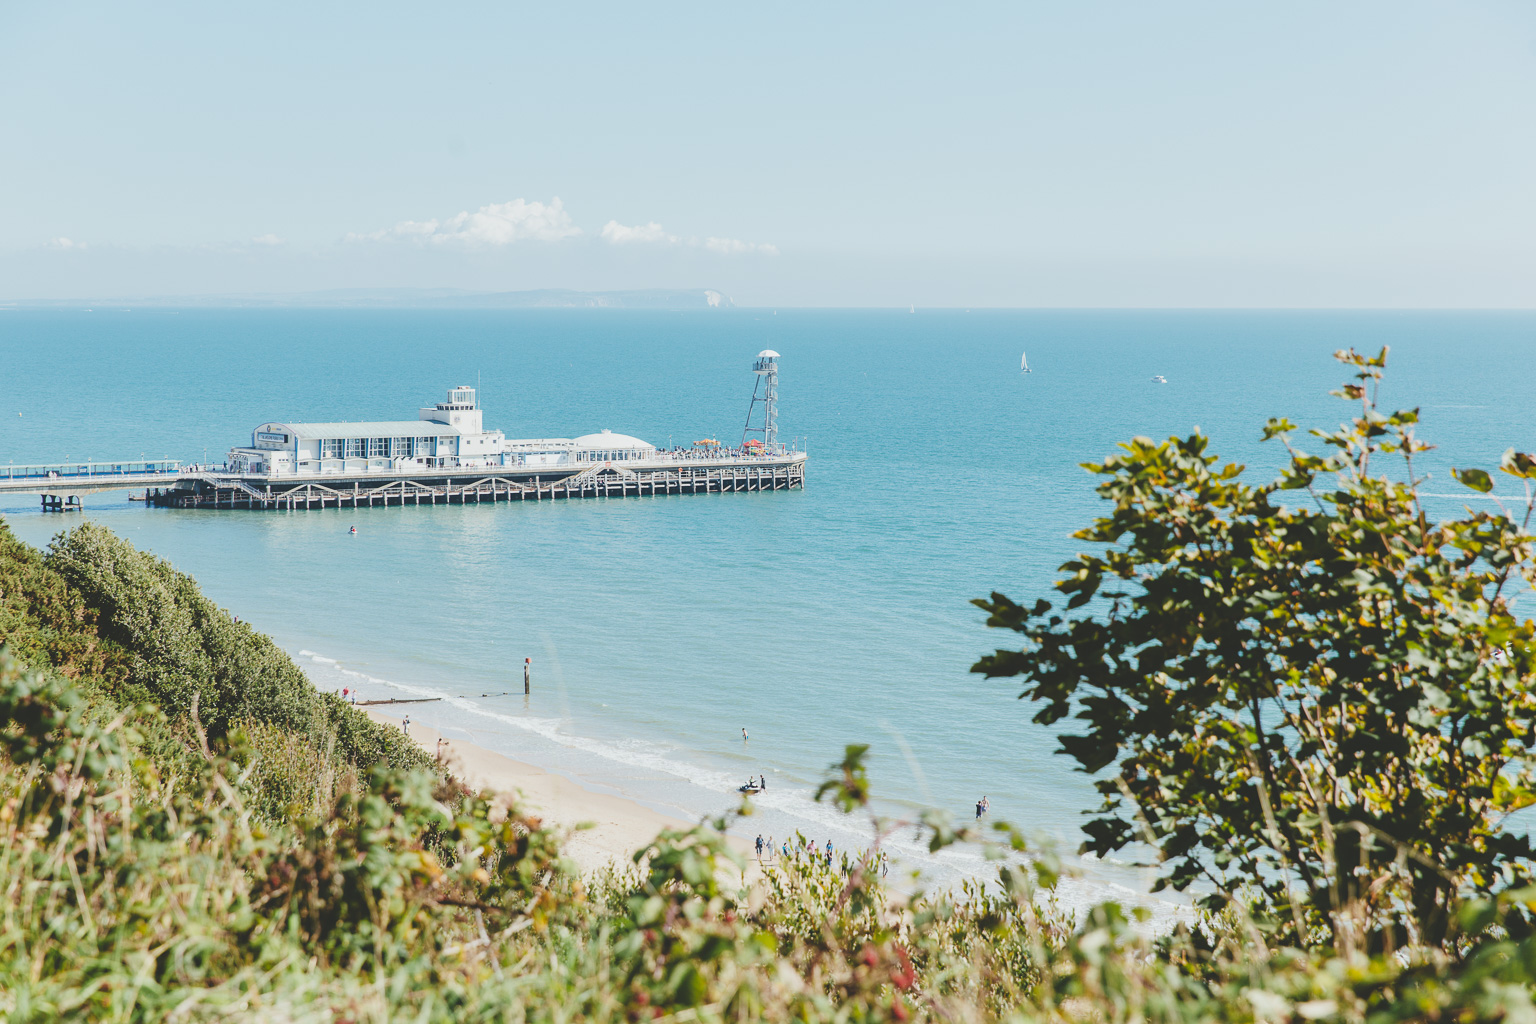 Beach-weddings-Bournemouth-00006